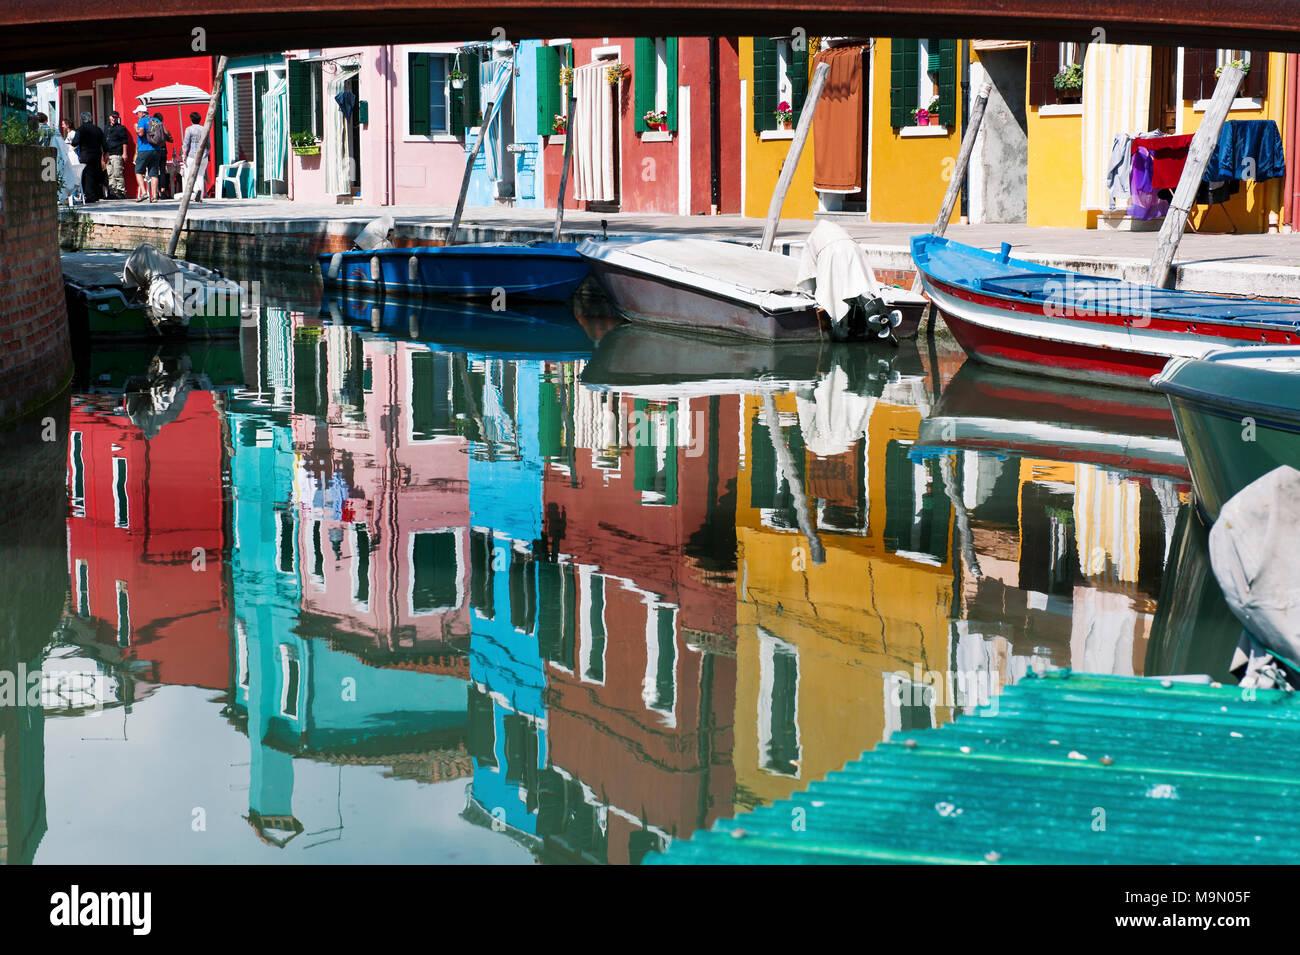 BURANO, Venedig, Italien - 16 April 2017: Bunte Häuser Reflexion in den Kanal Stockbild